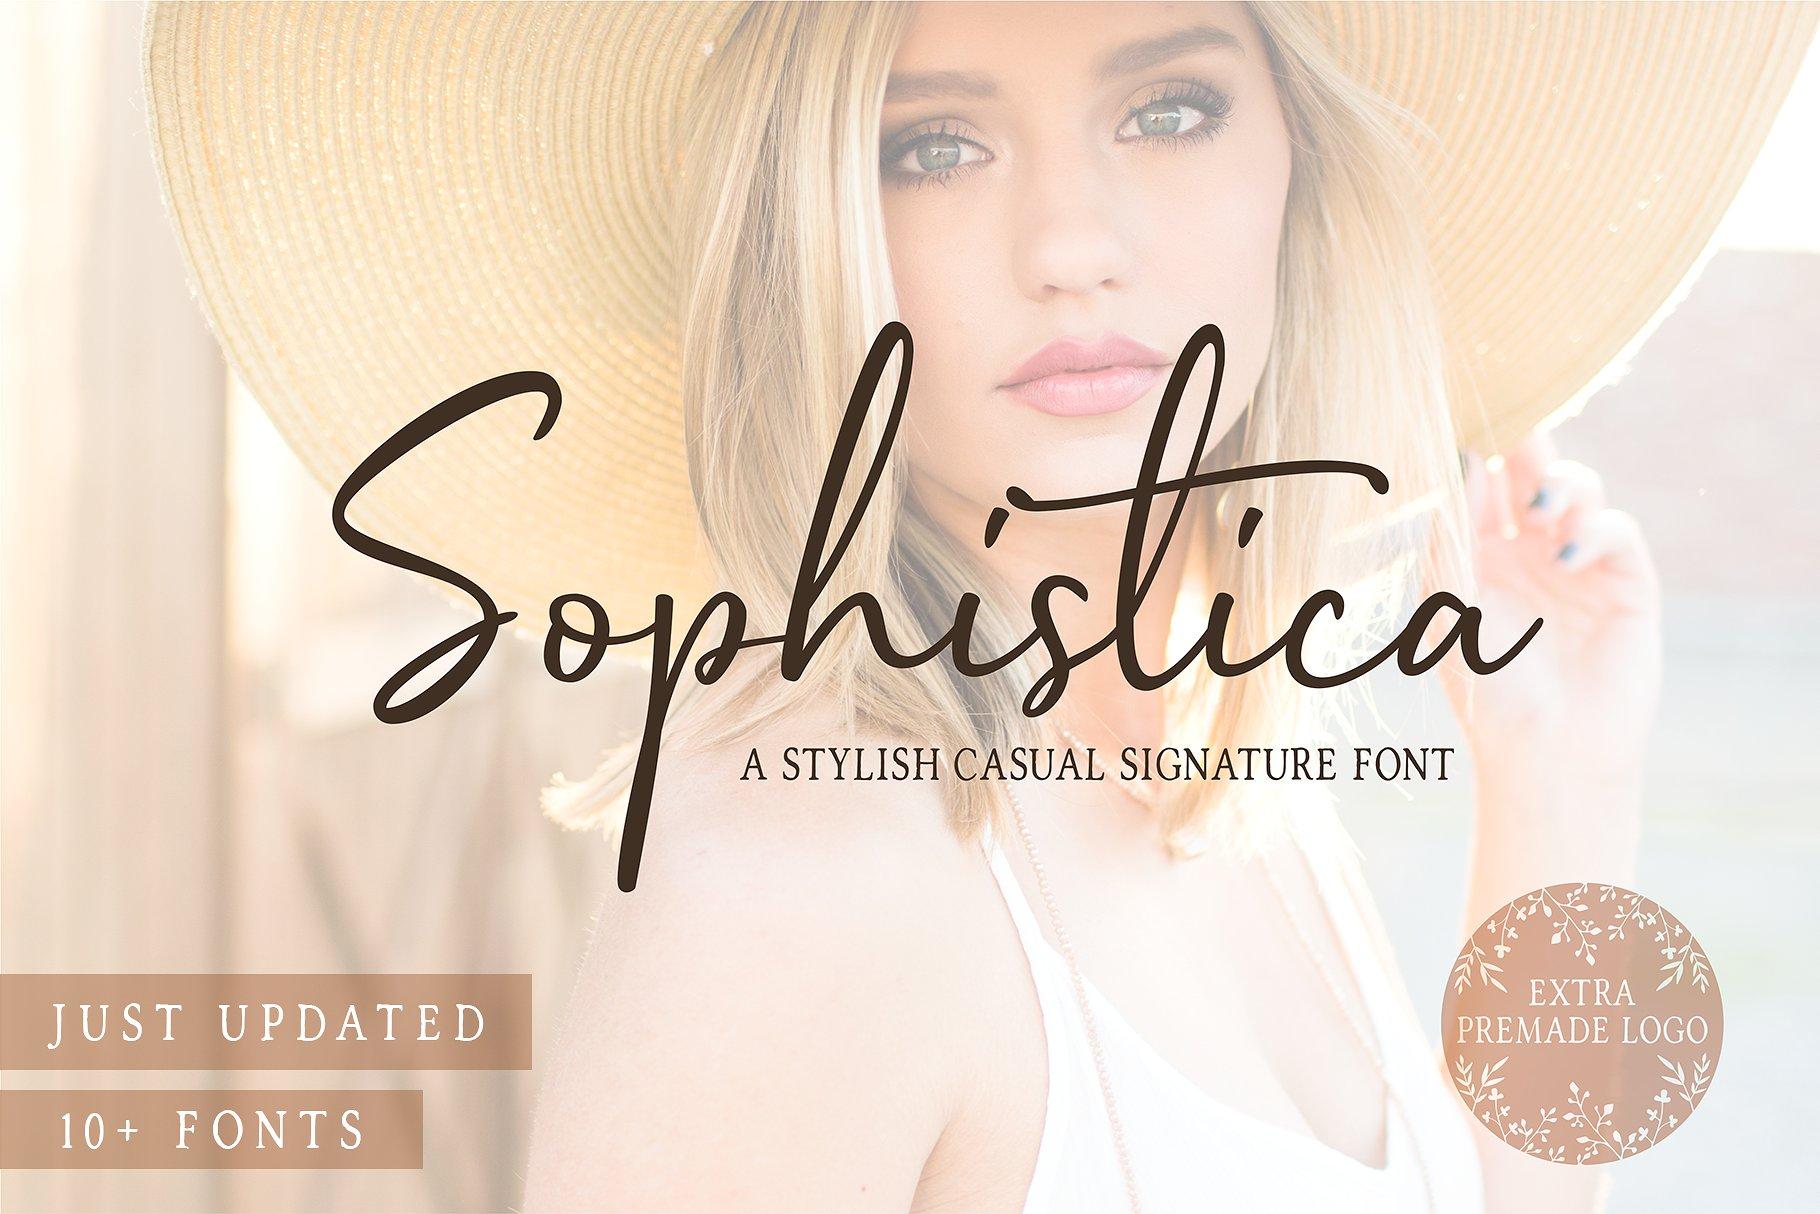 Free Download: Sophistica Font